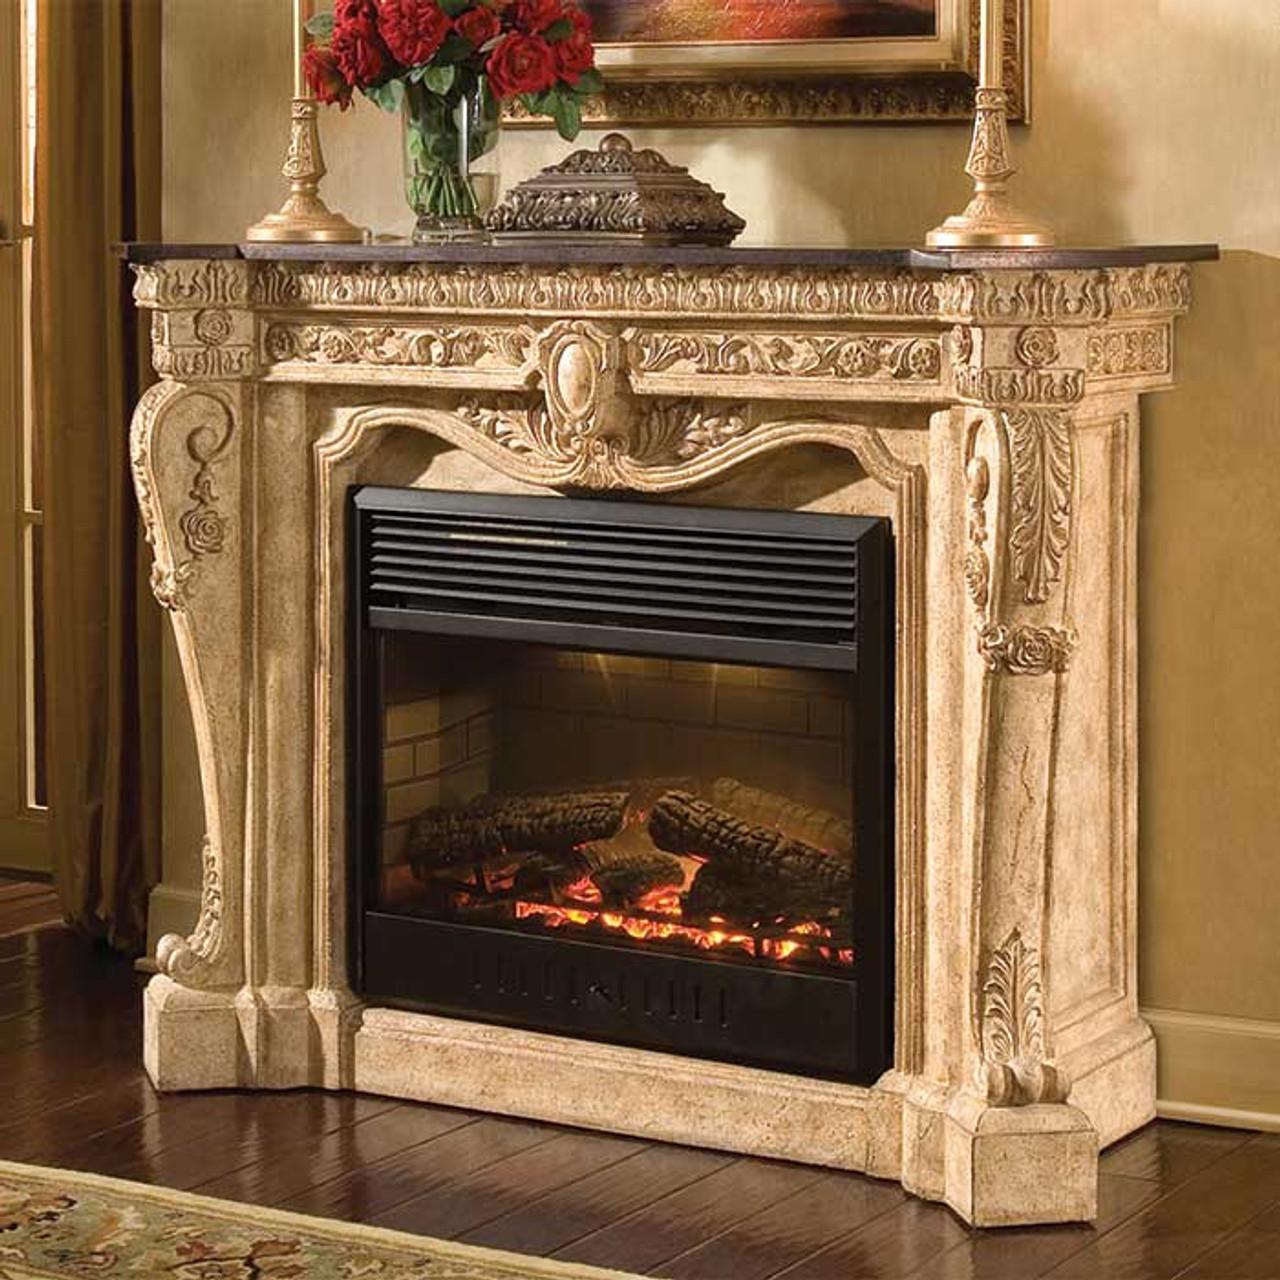 Versailles Fireplace Magnolia Hall